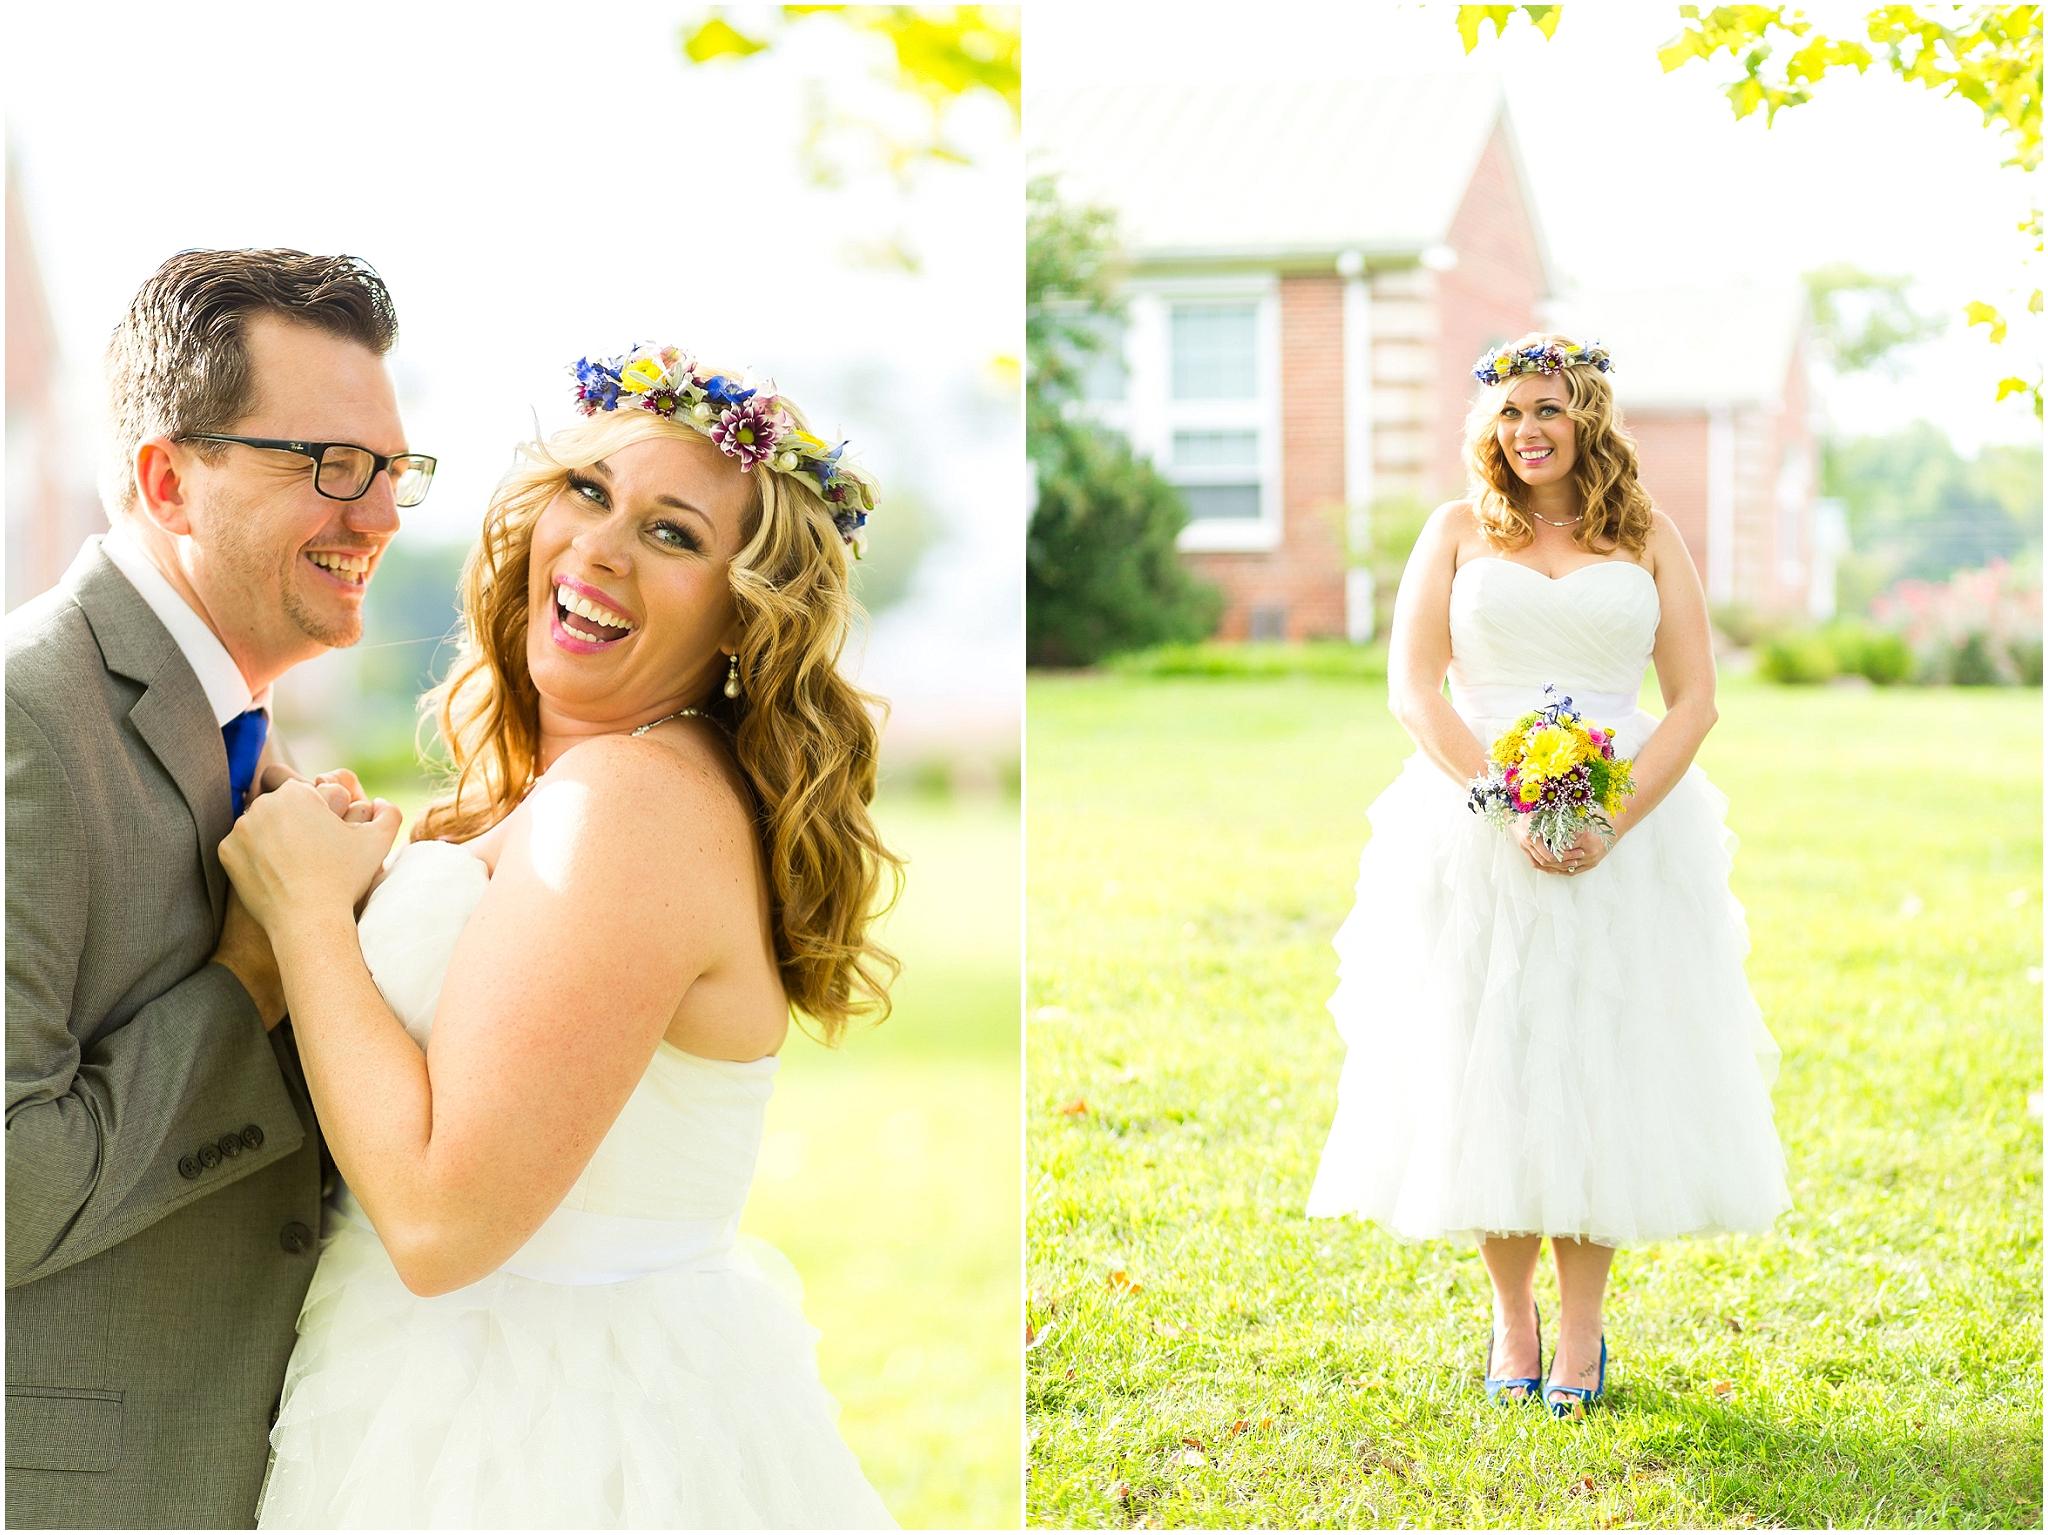 Tiffany Heidenthal - Outdoor Wedding Photography_0076.jpg